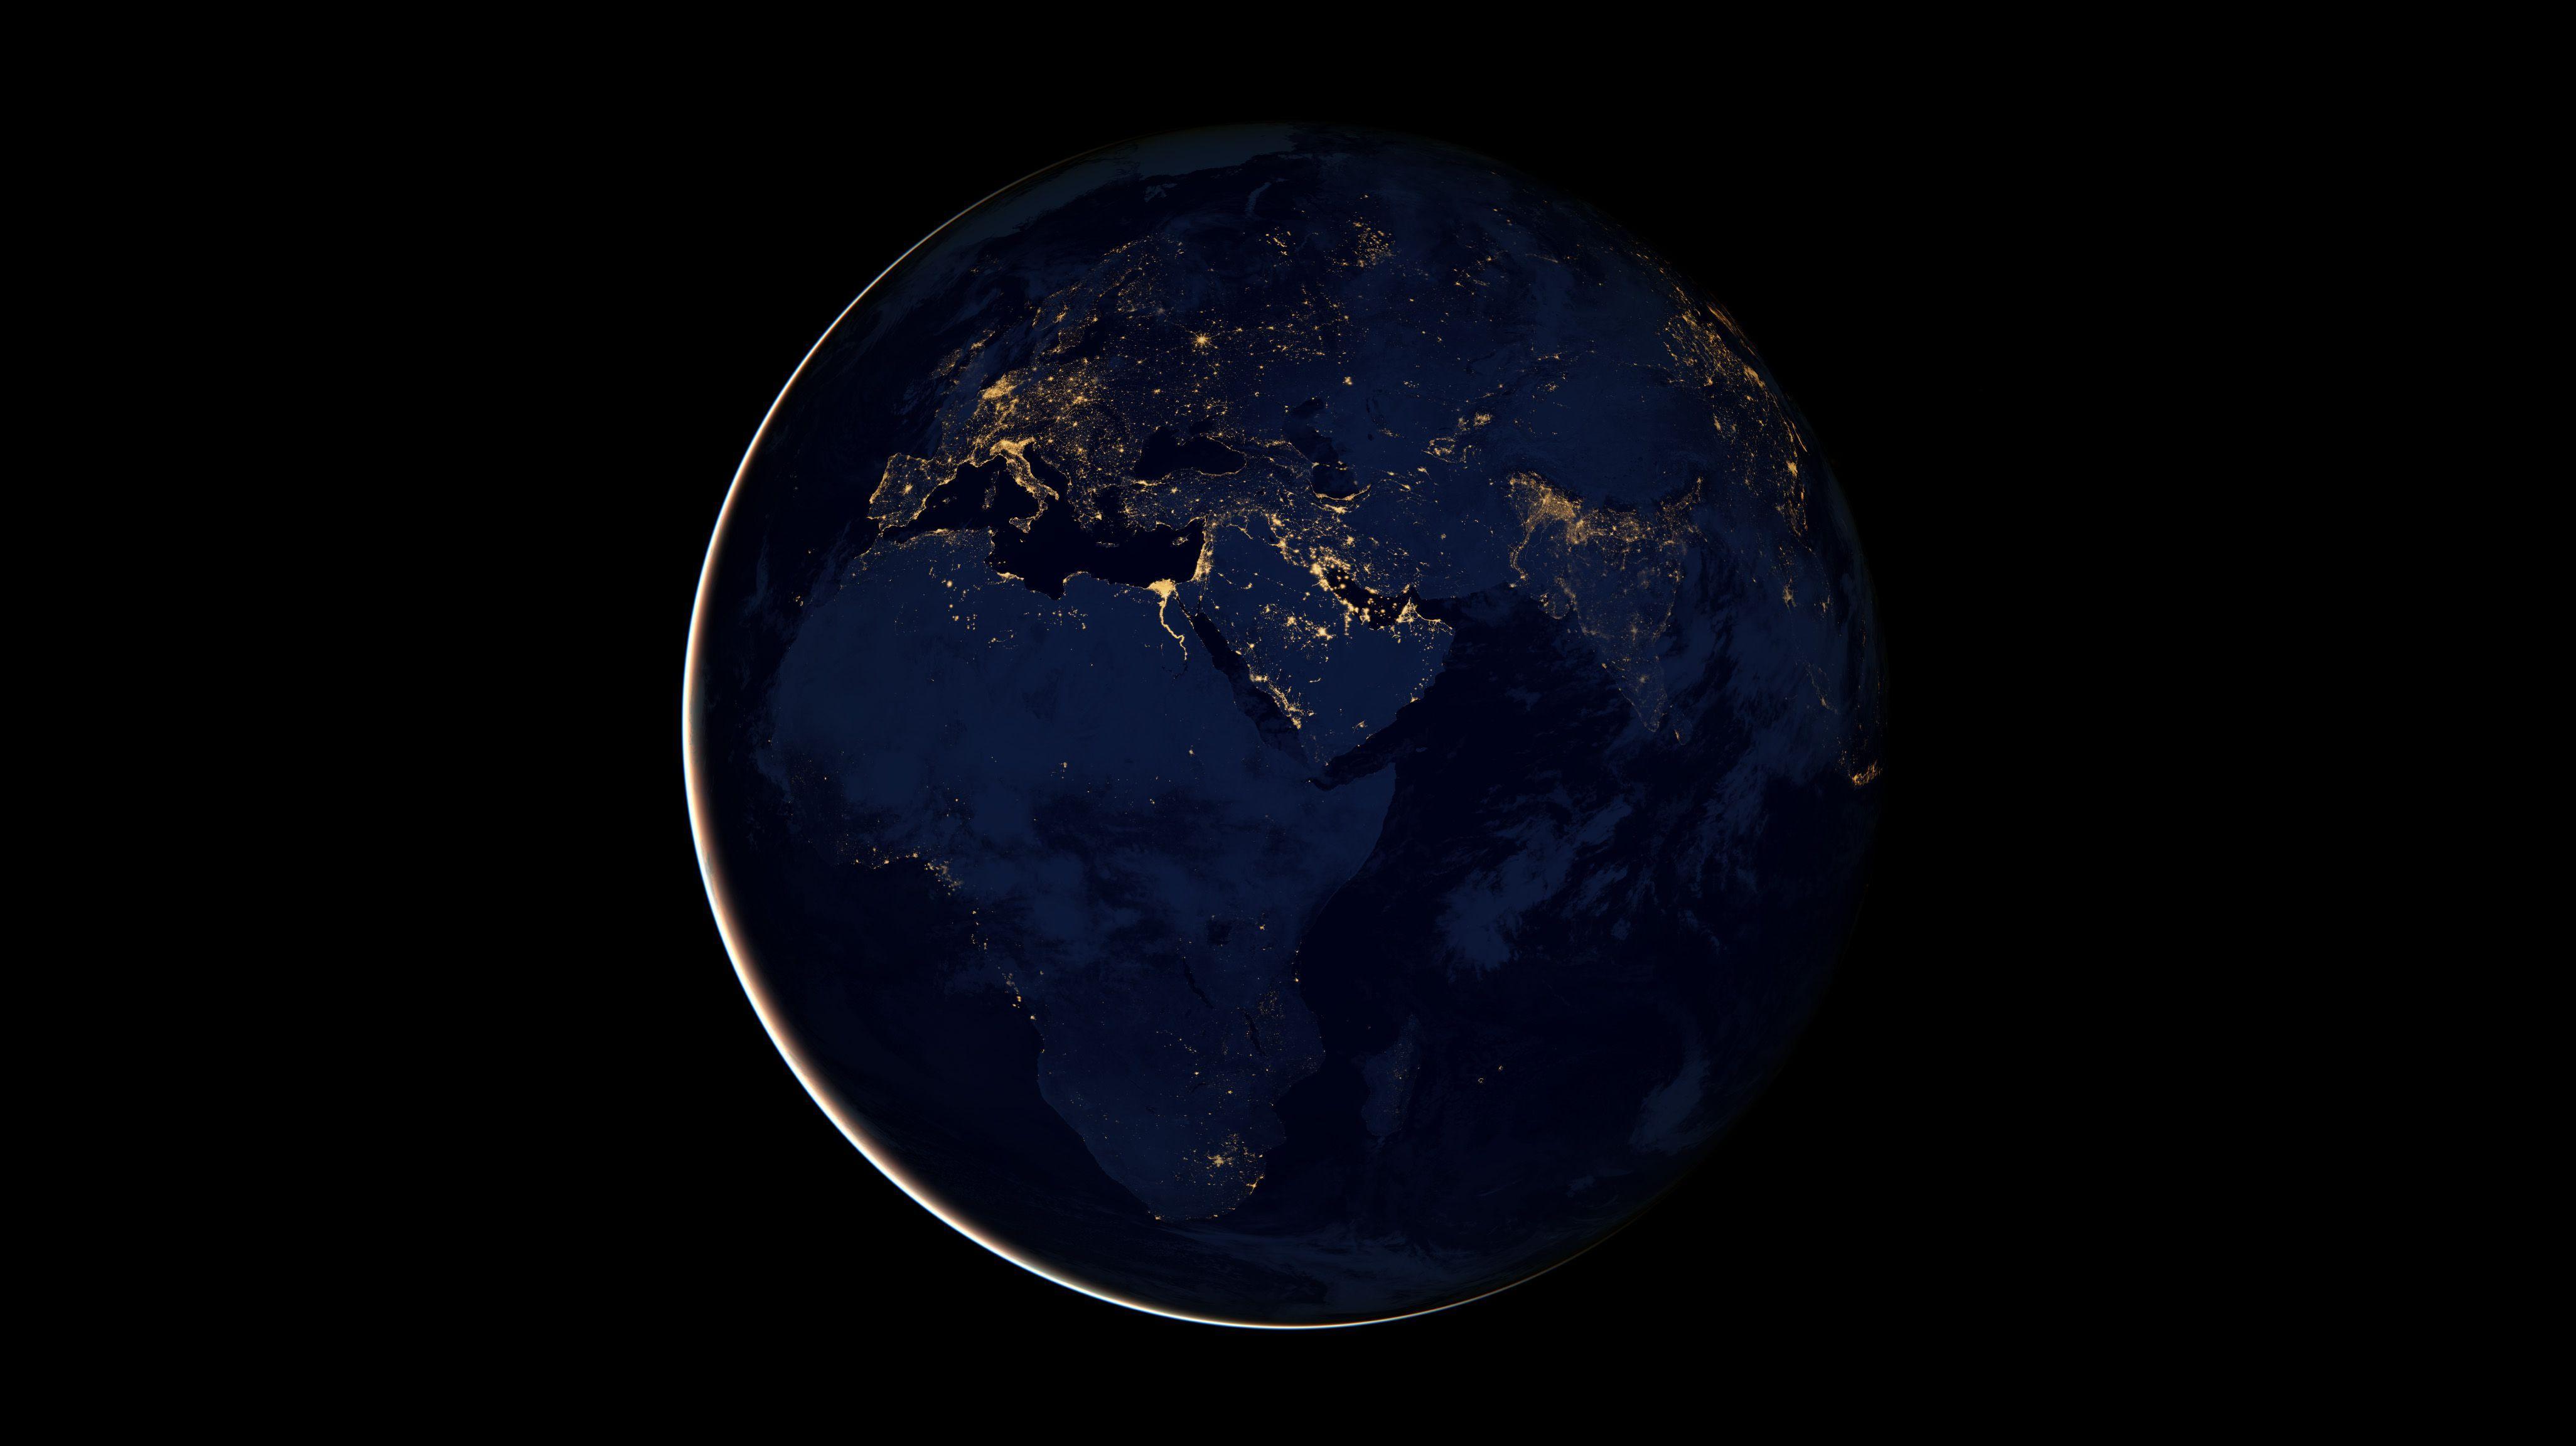 dreamscene animated rotating earth space